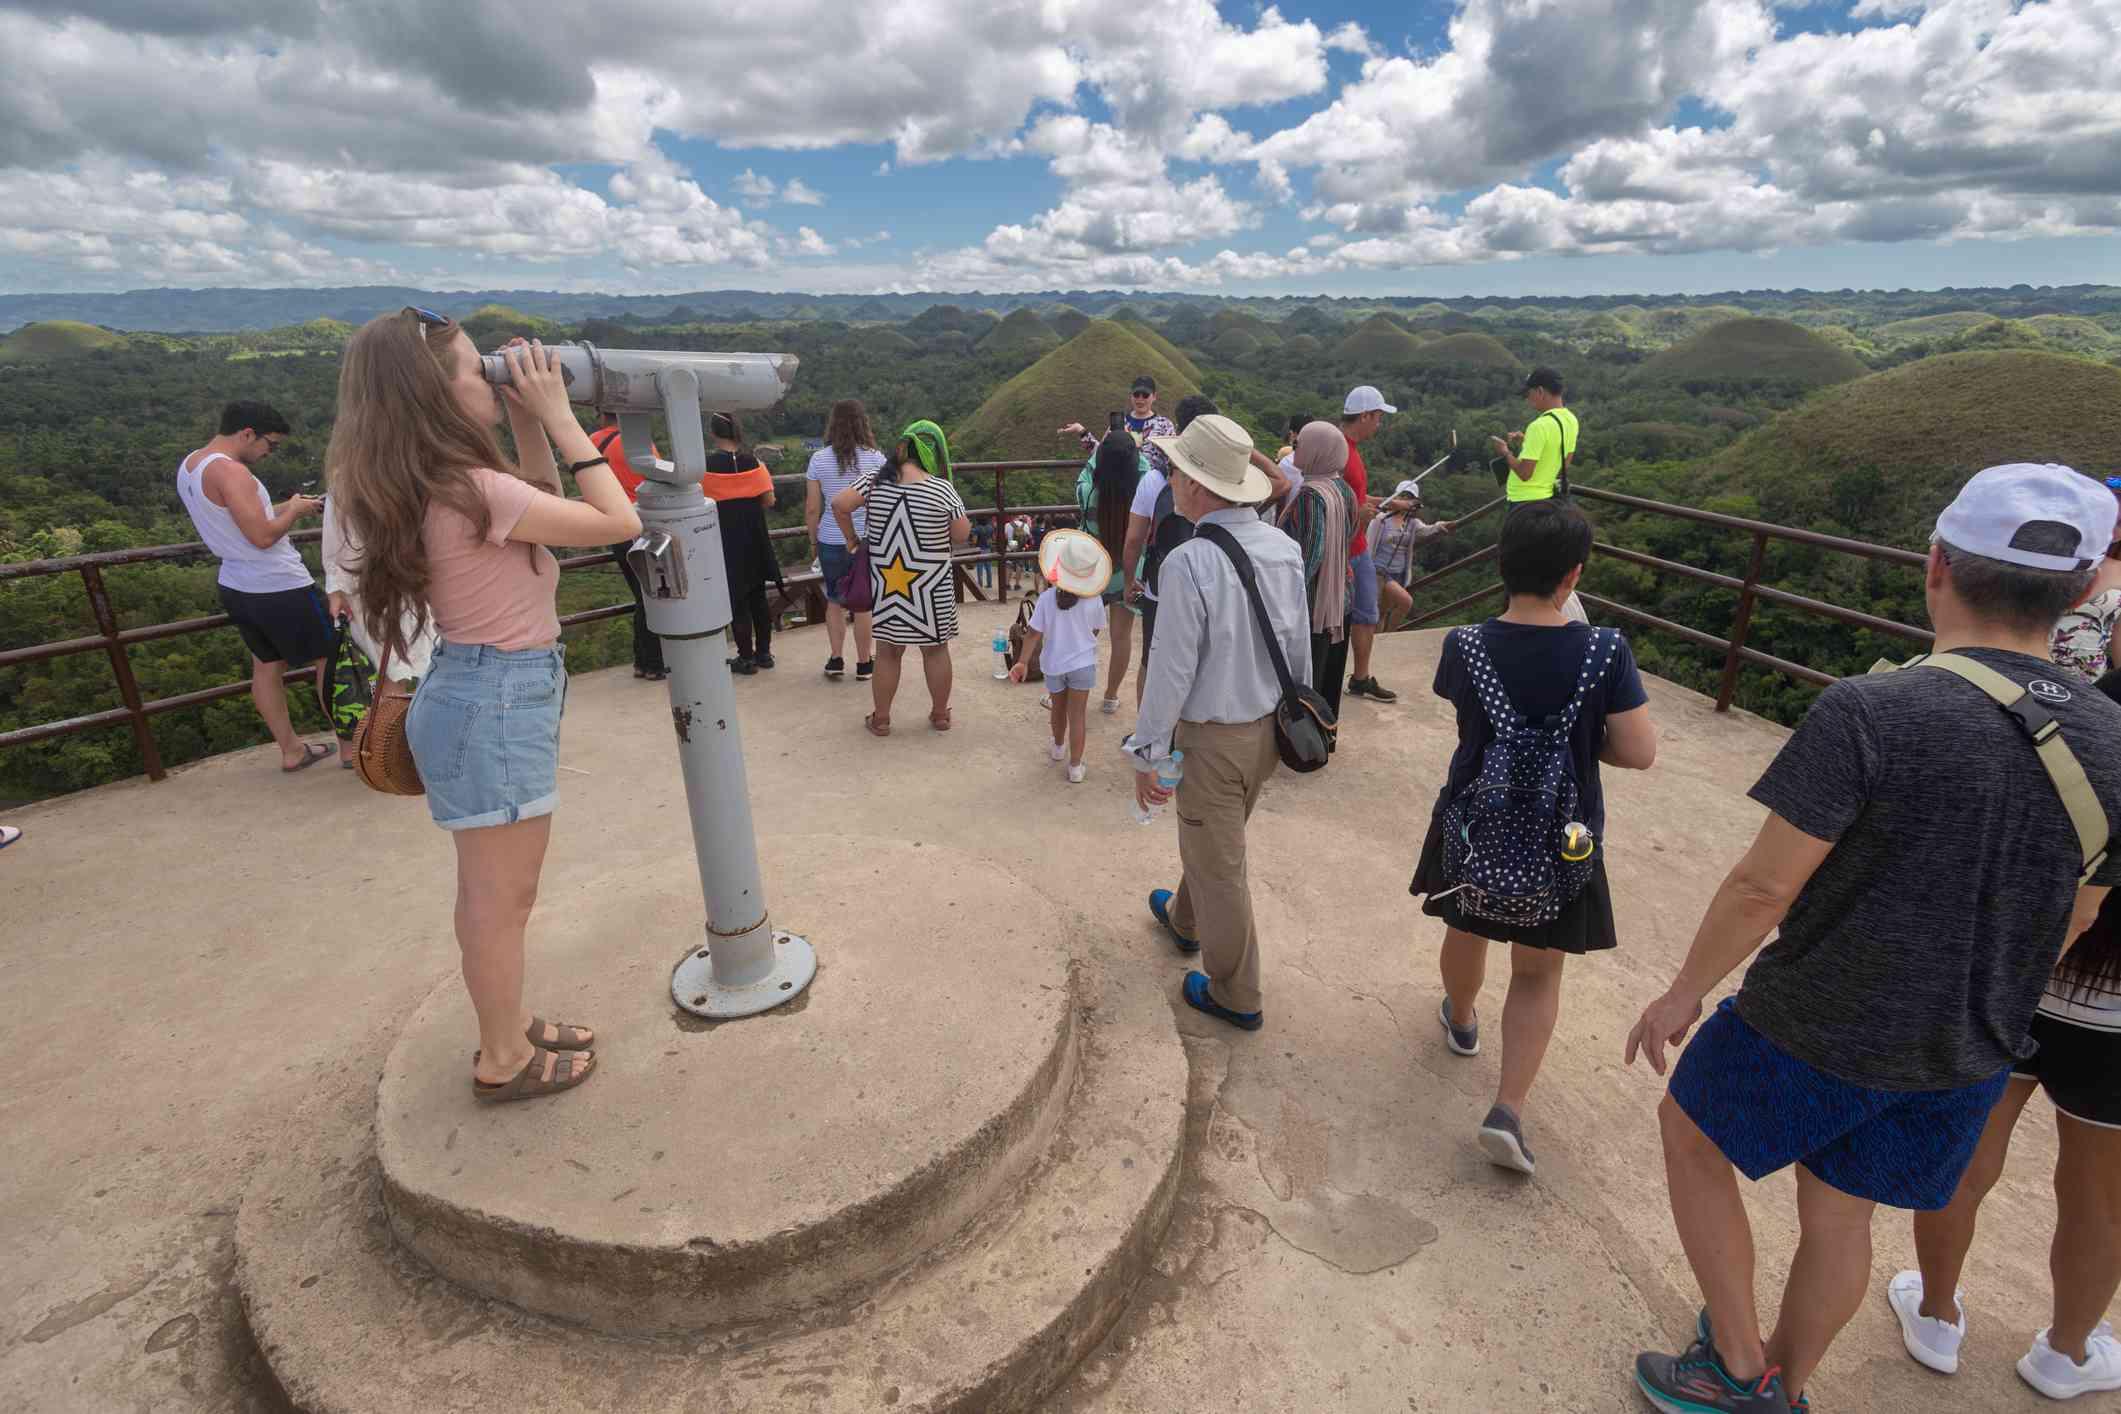 Visitors to Chocolate Hills Viewdeck, Bohol, Philippines